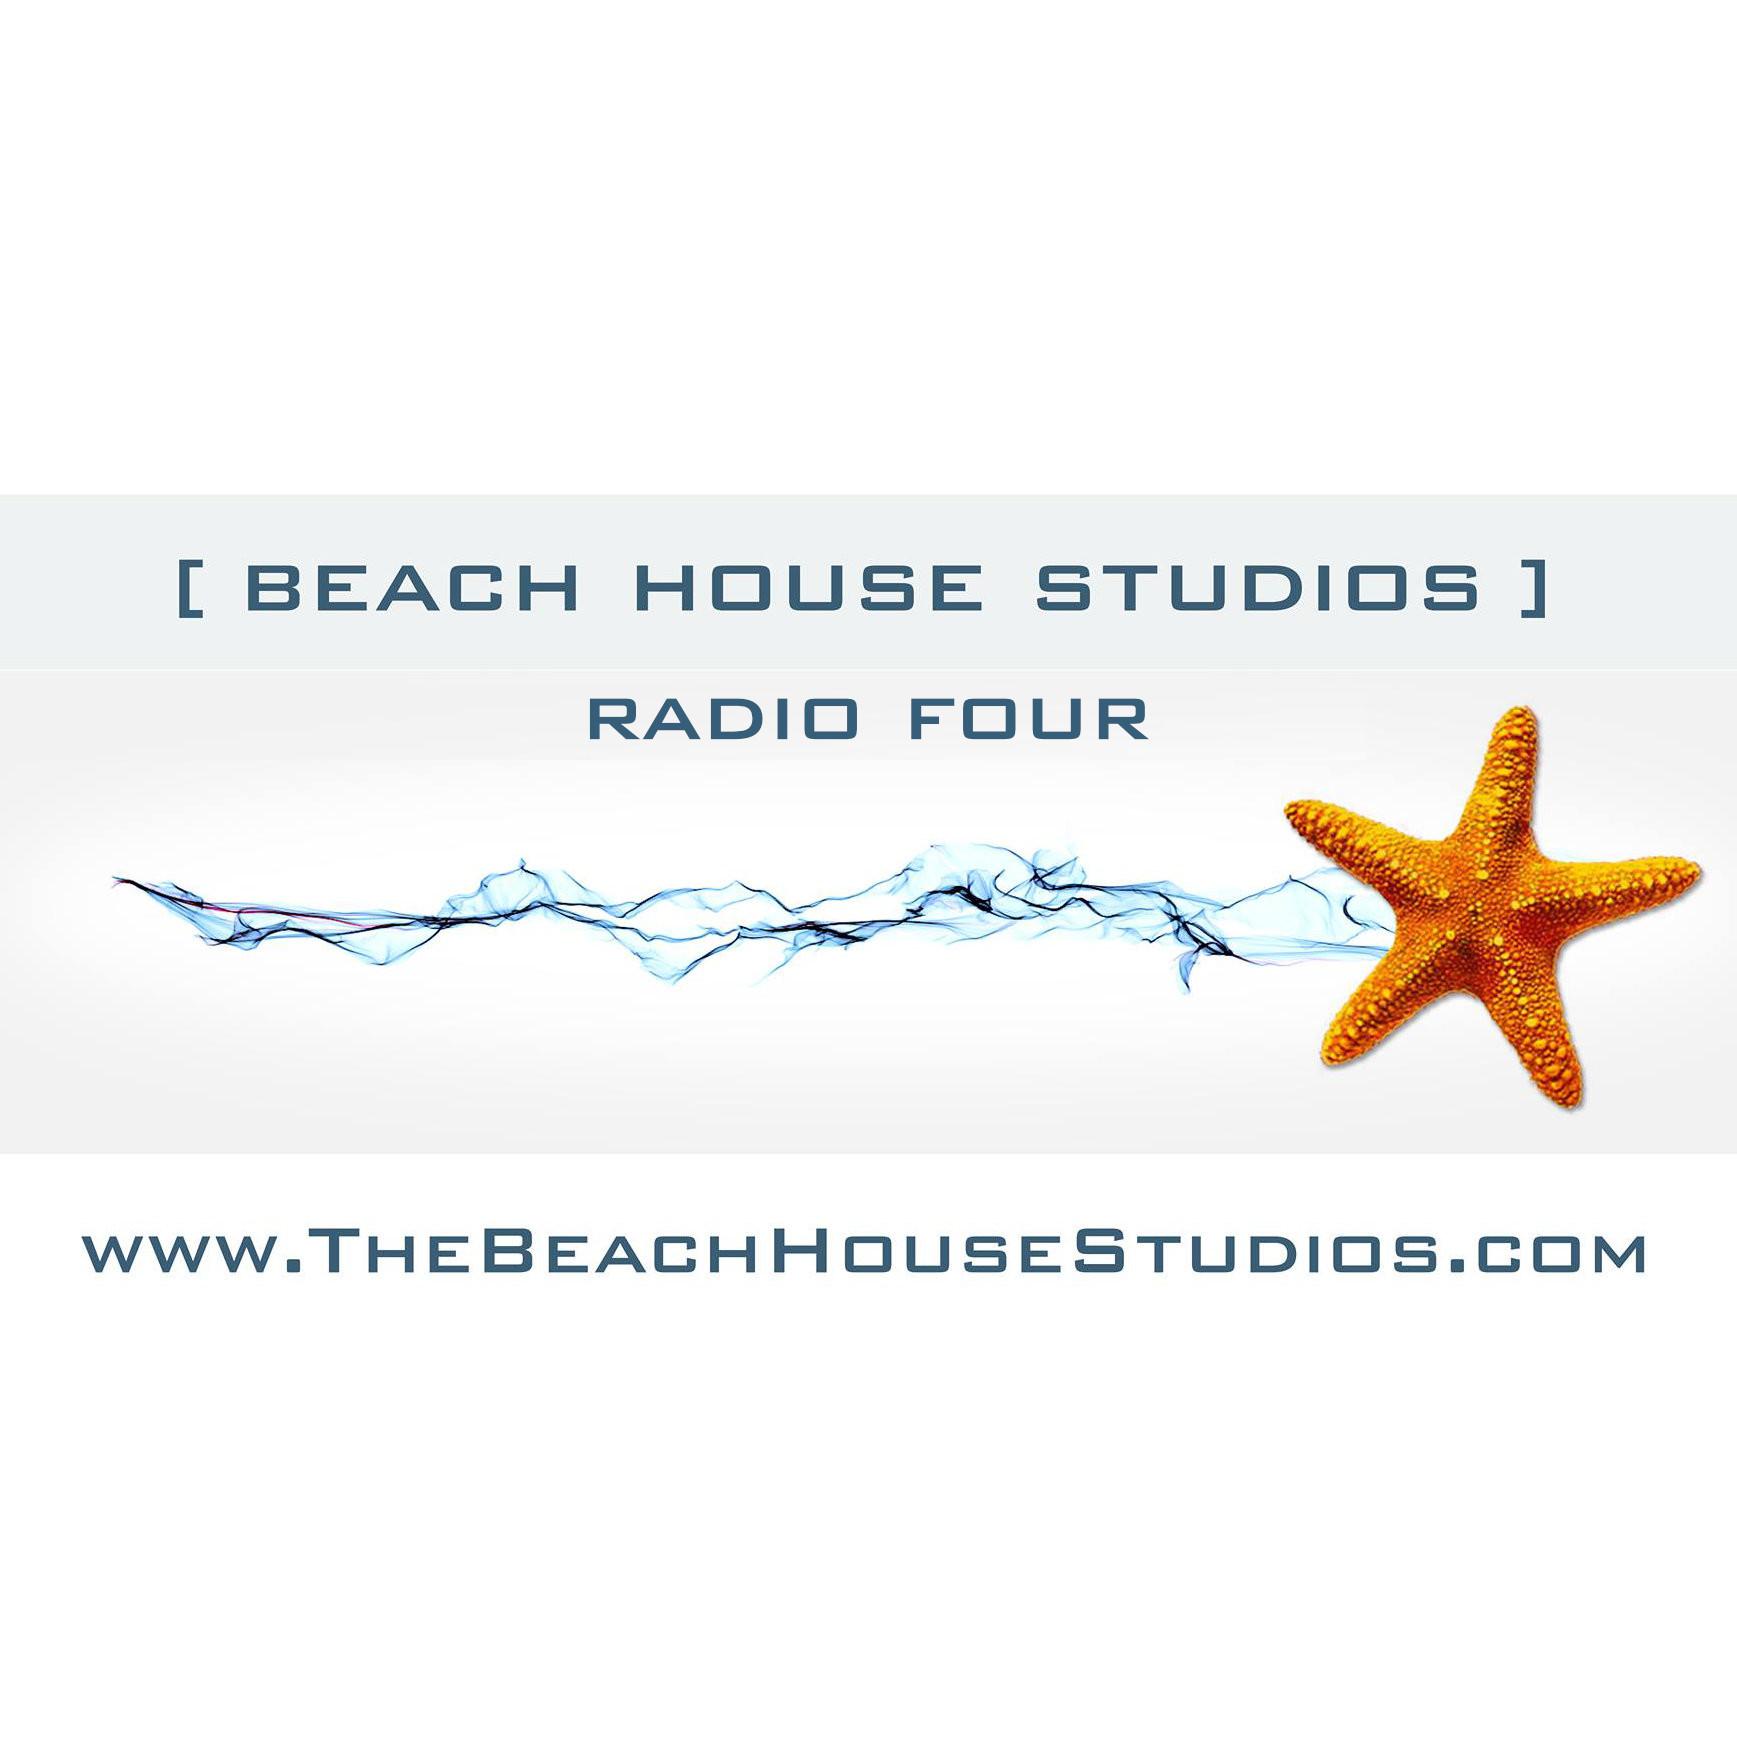 Beach House Studios Radio Four logo